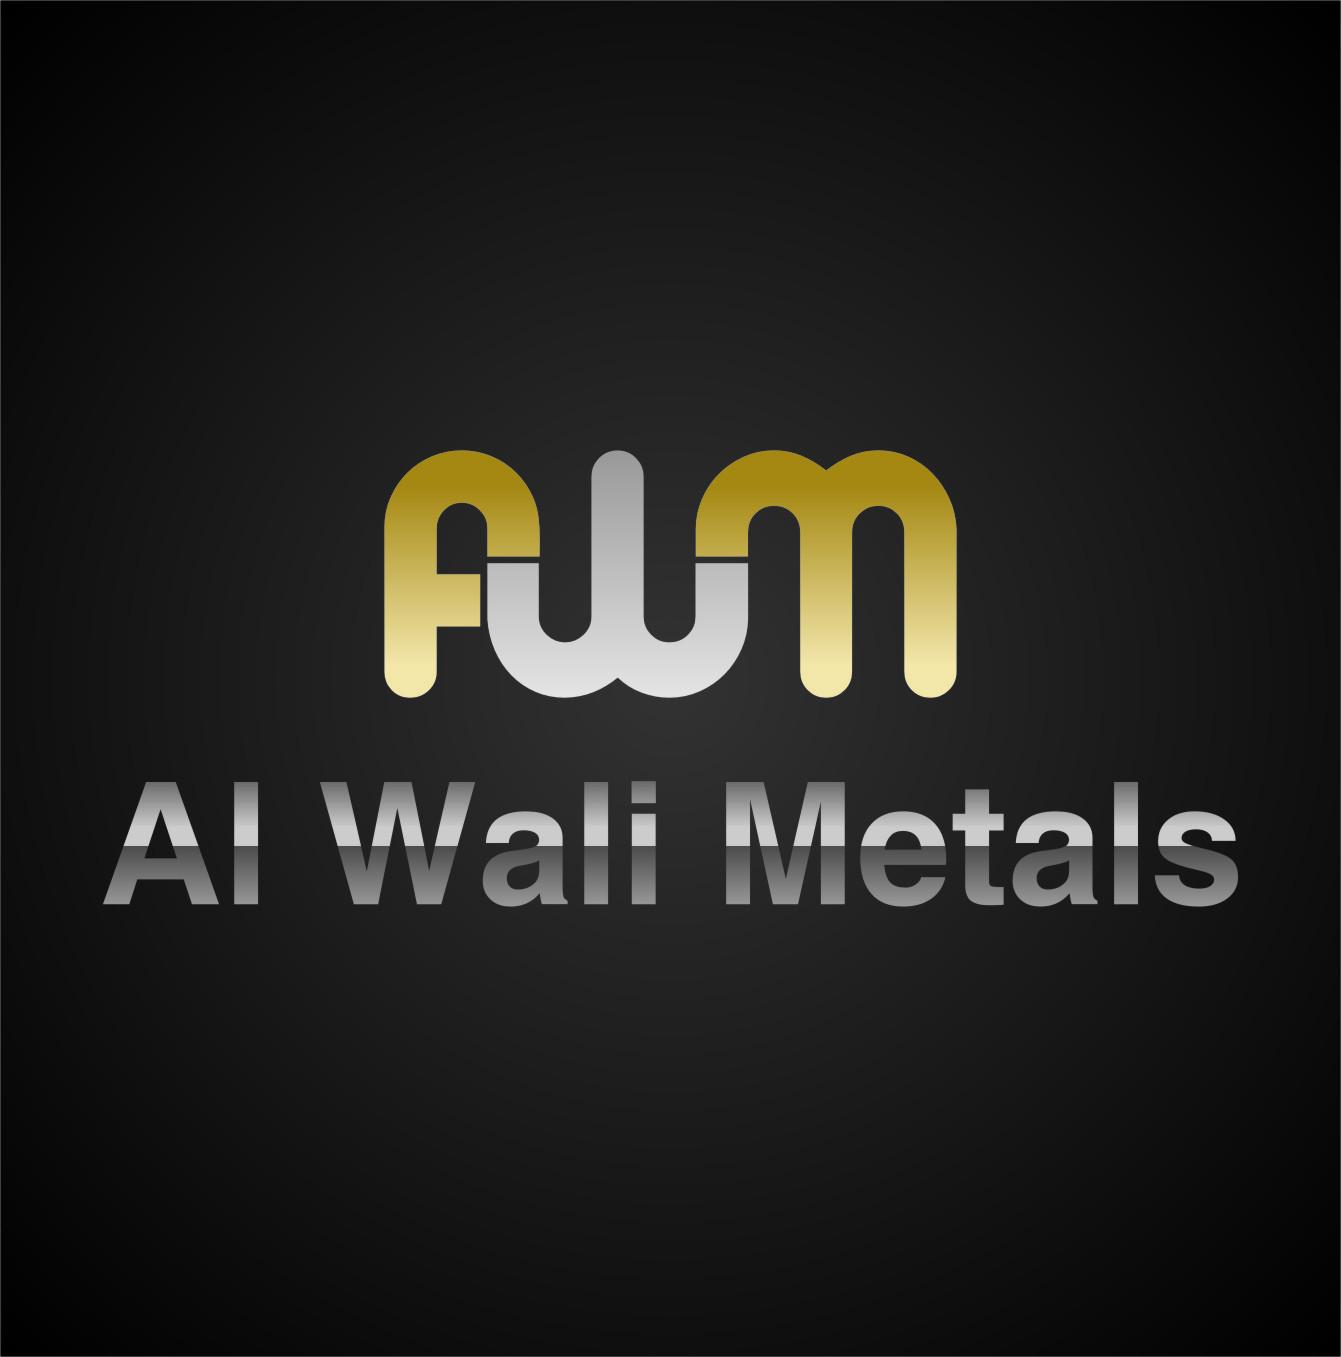 Logo Design by Ngepet_art - Entry No. 111 in the Logo Design Contest Inspiring Logo Design for Al Wali Metals.